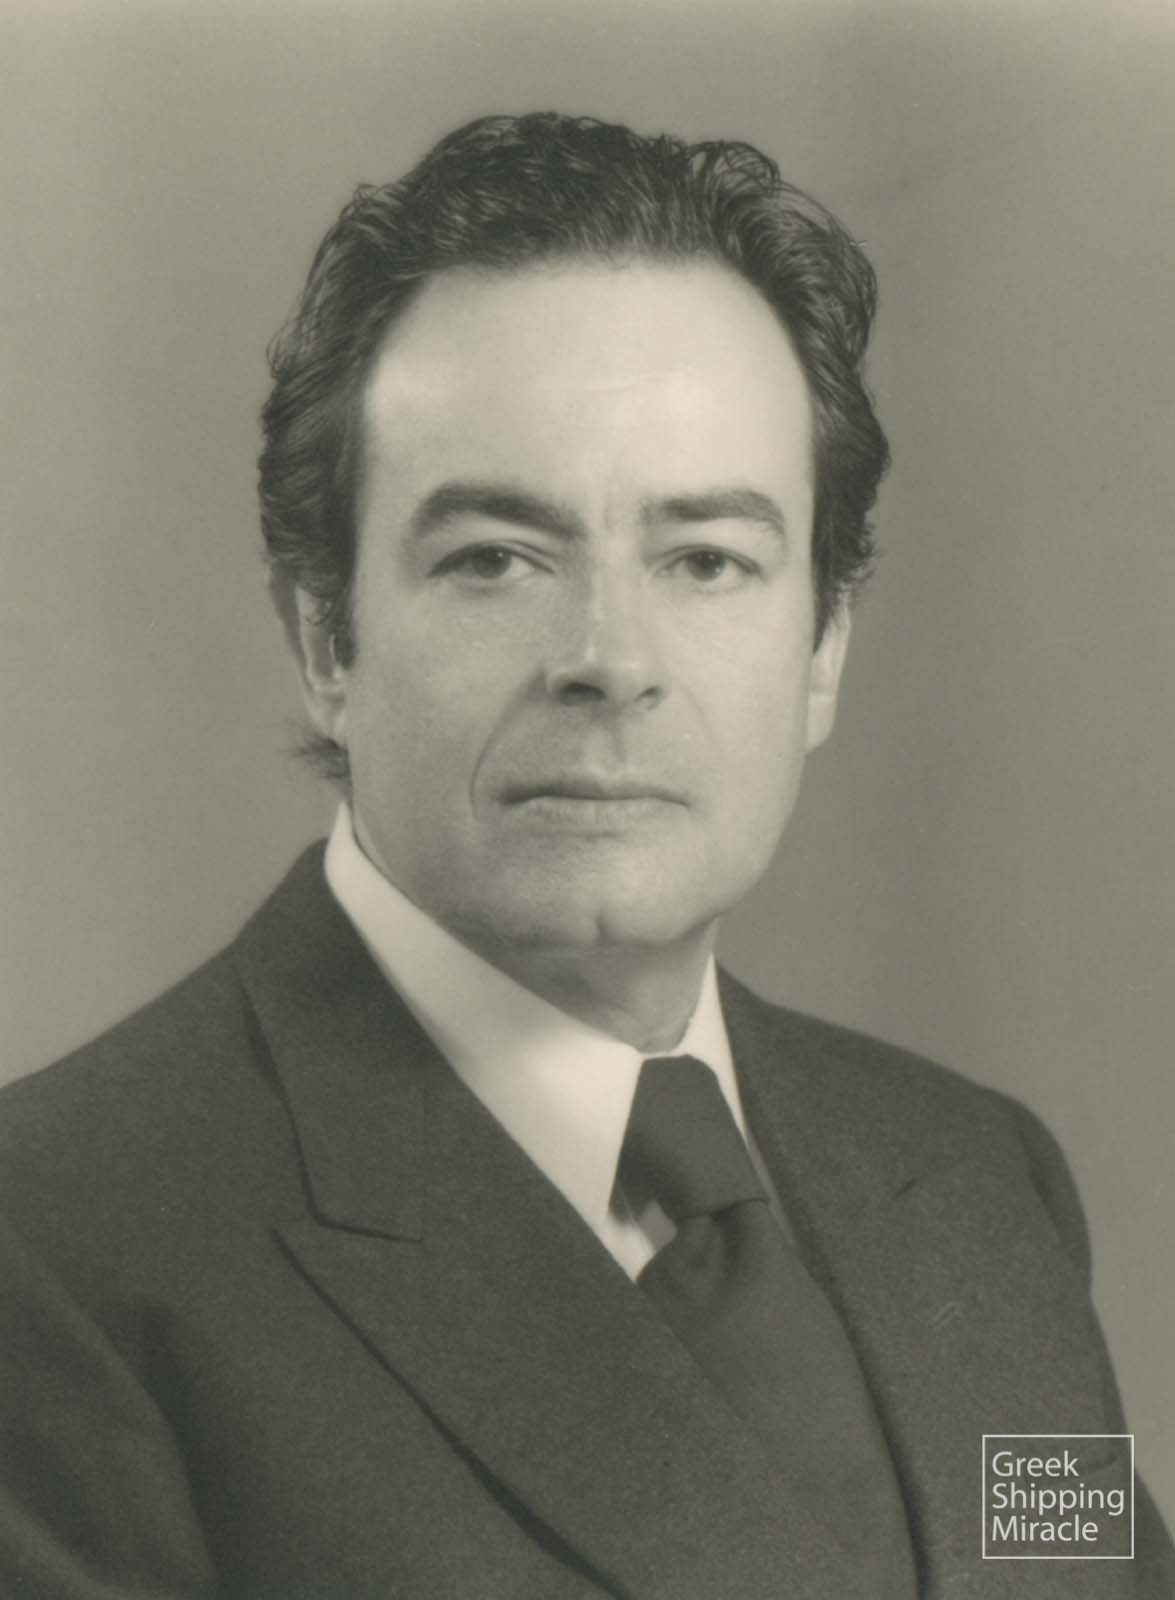 1_GEORGE_A_EMBIRICOS_portrait